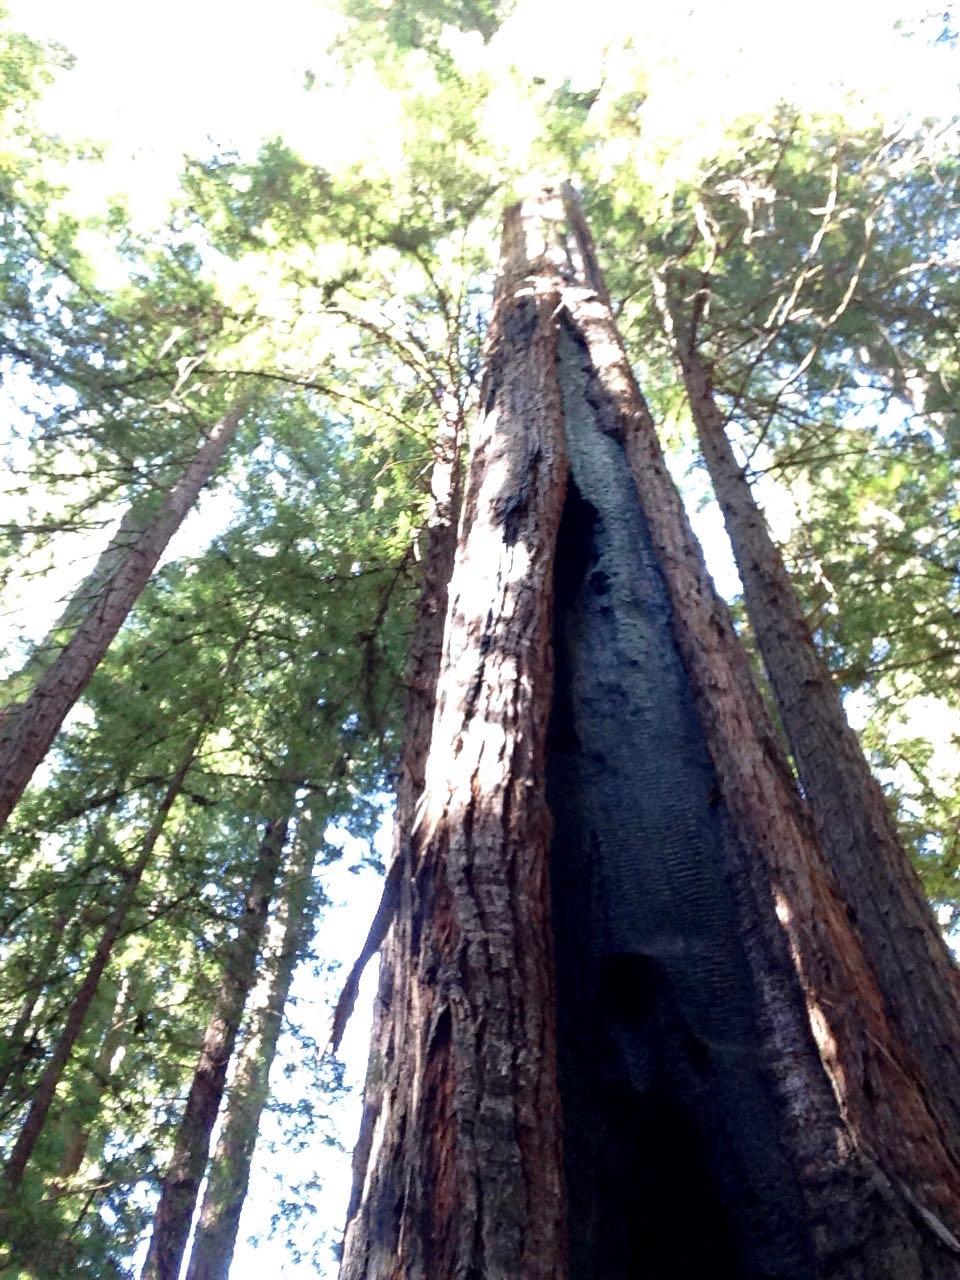 Redwoods 2017 10 01 16 Of 244